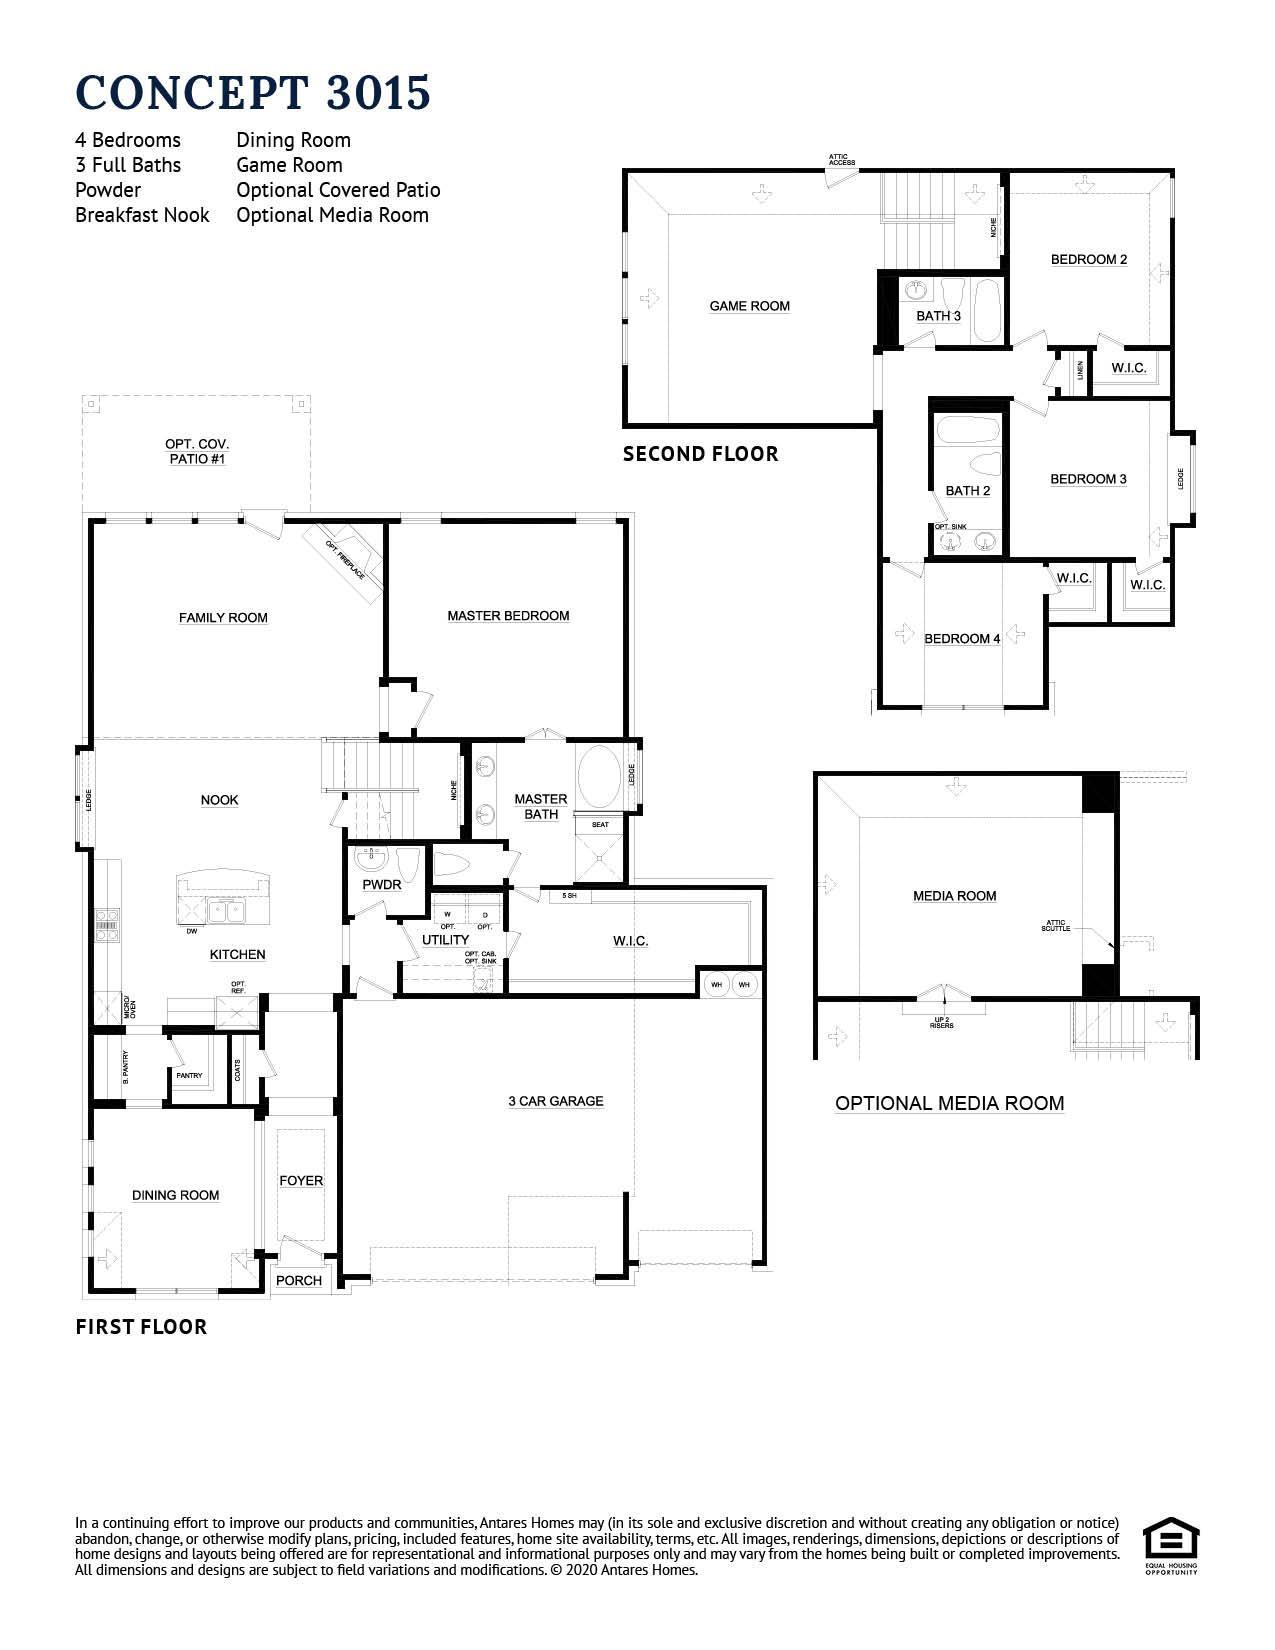 Concept 3015 Floorplan